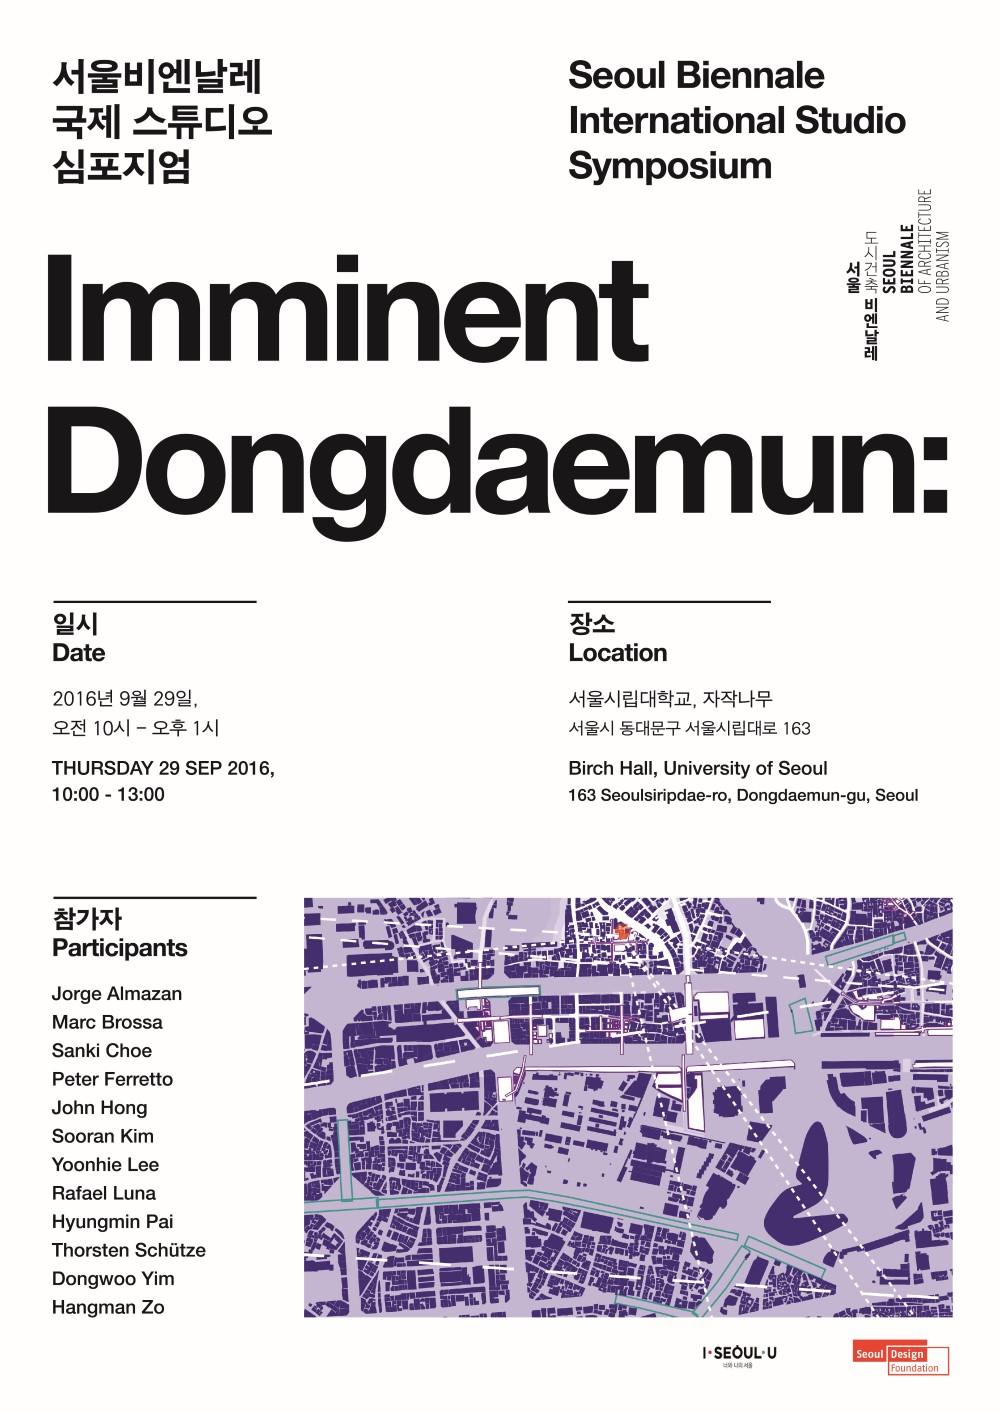 imminent dongdaemun symposium